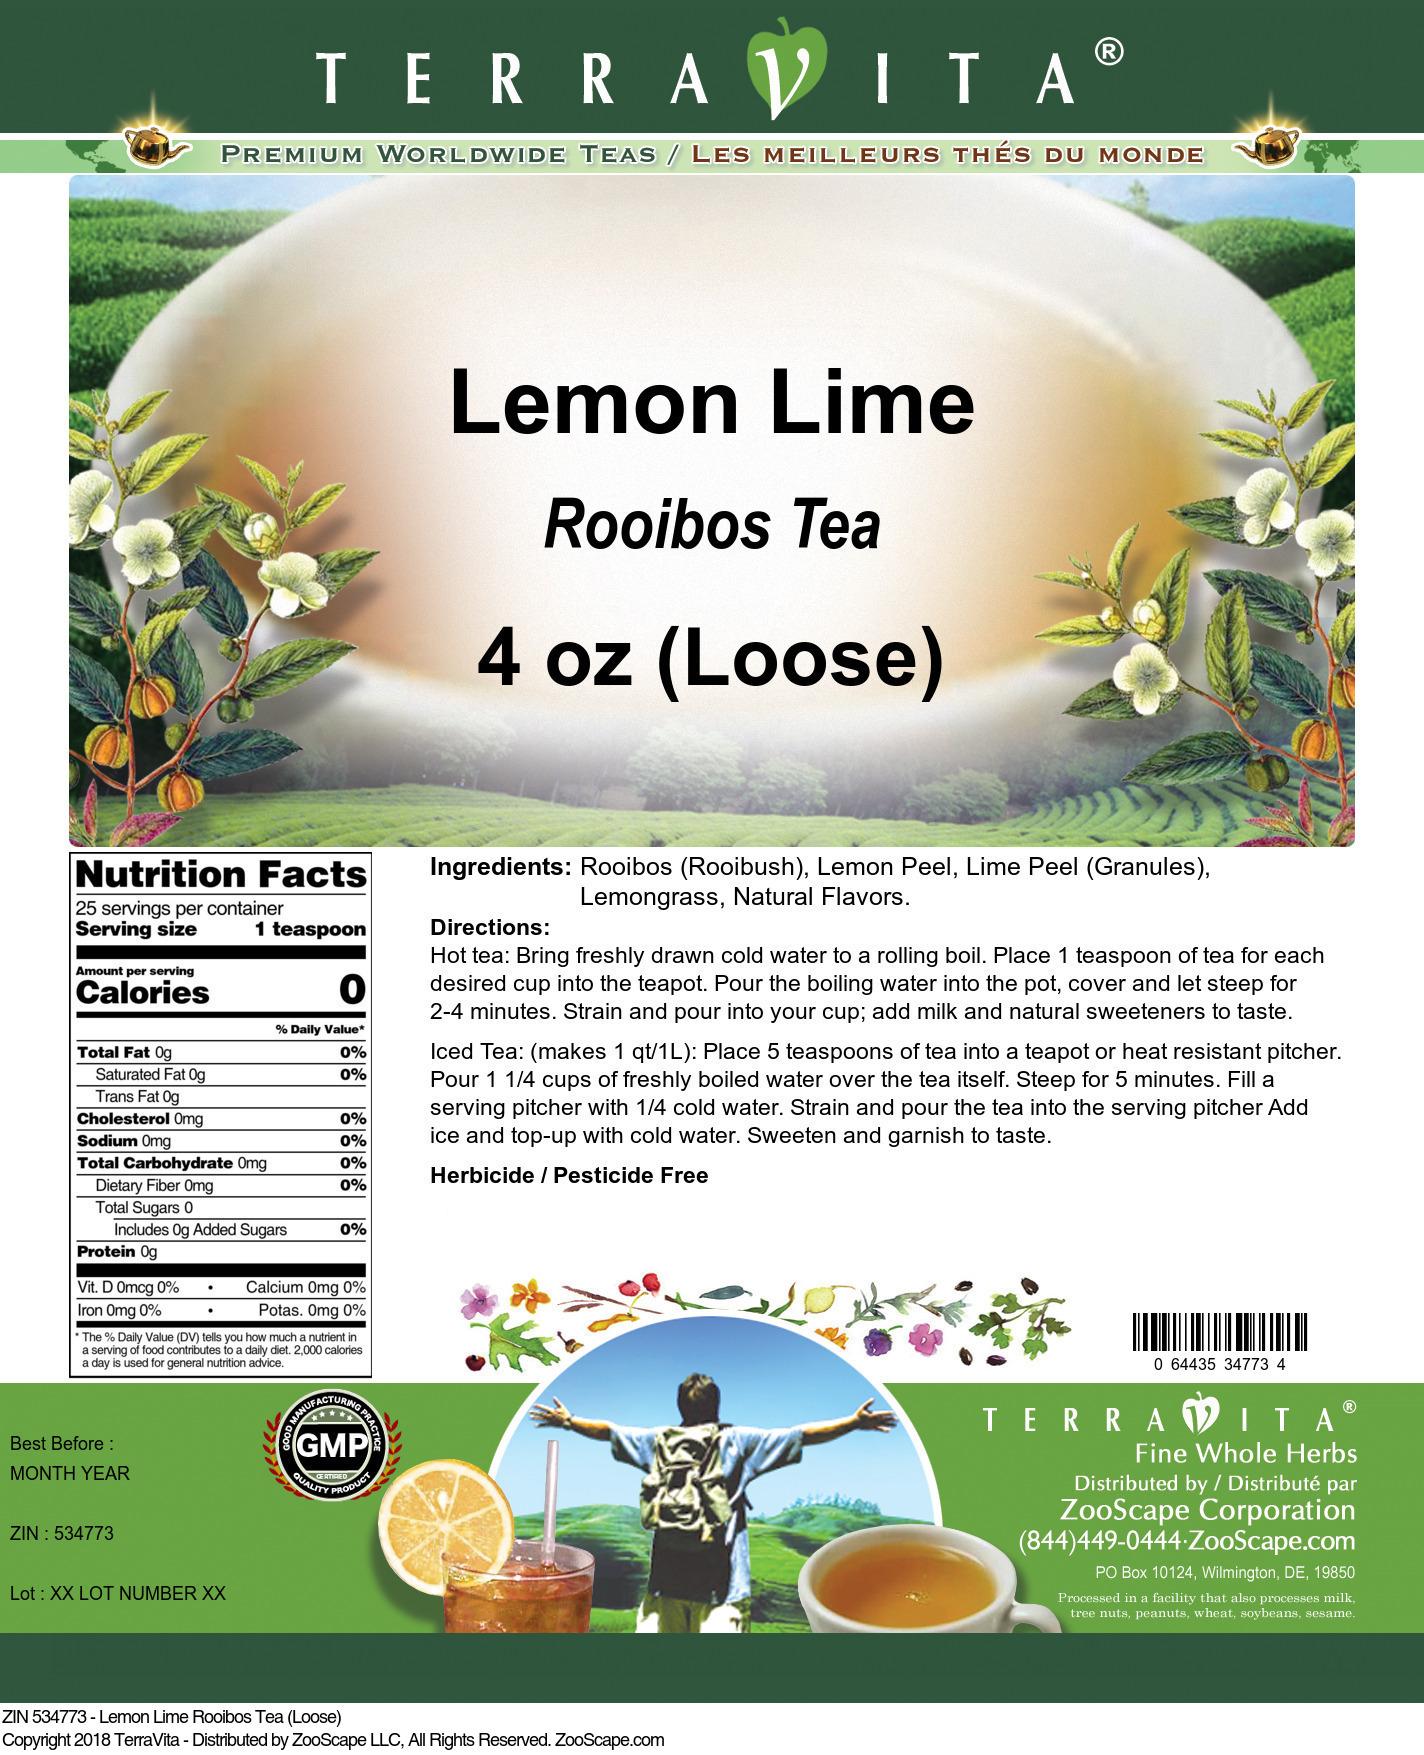 Lemon Lime Rooibos Tea (Loose)